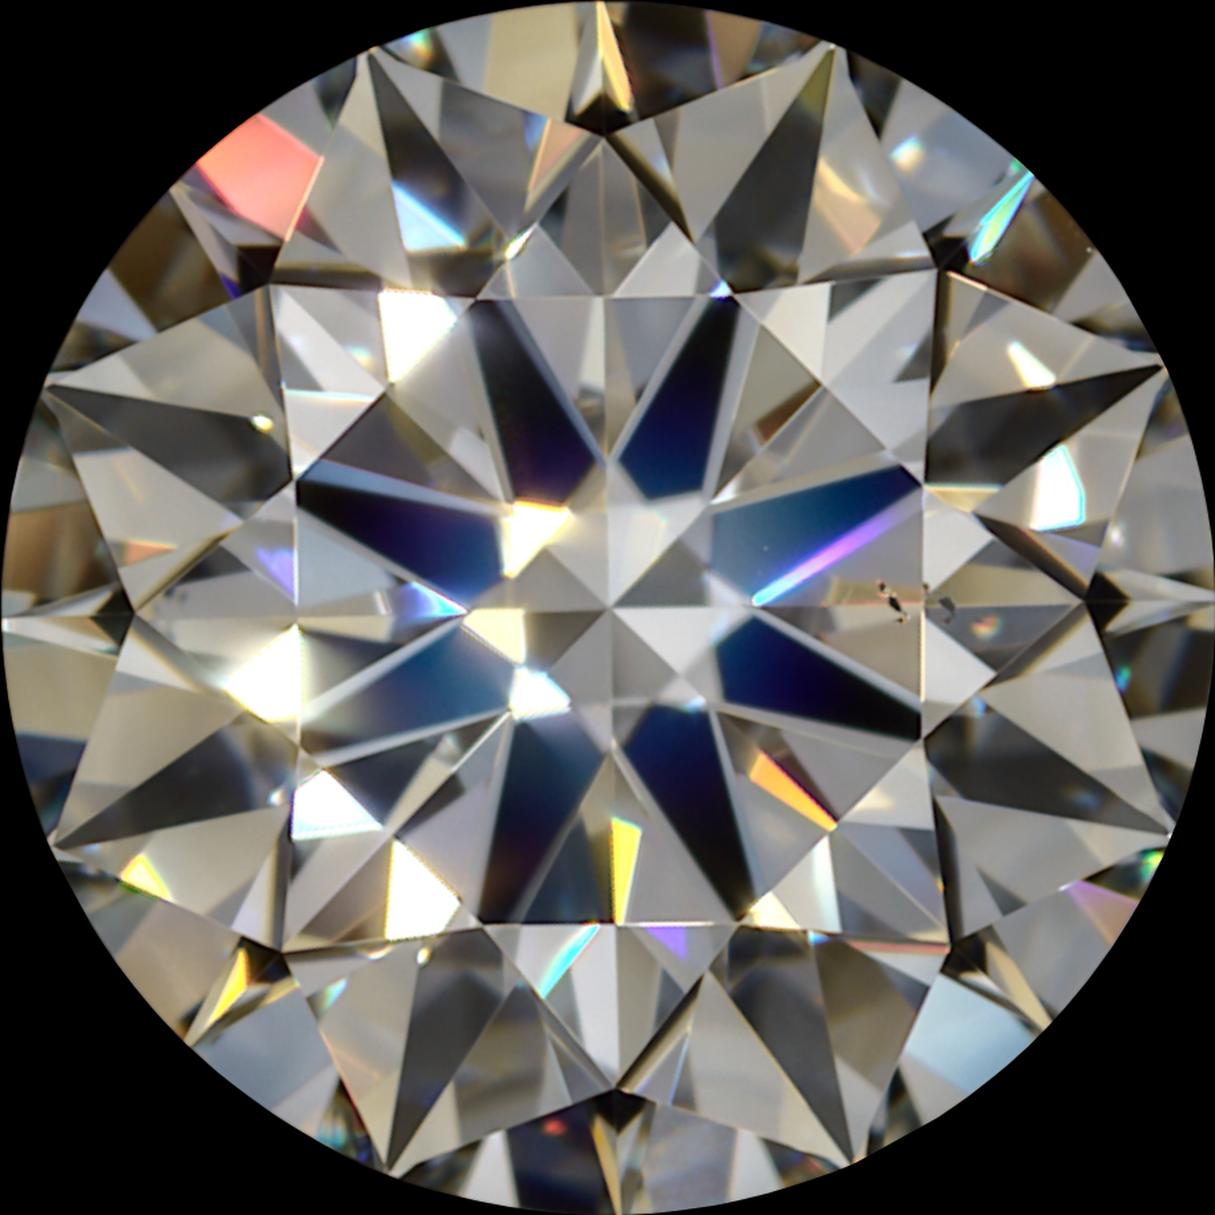 https://cdn.briangavindiamonds.com/files/mp4/AGS-104107436008/AGS-104107436008-Fire-02.mp4